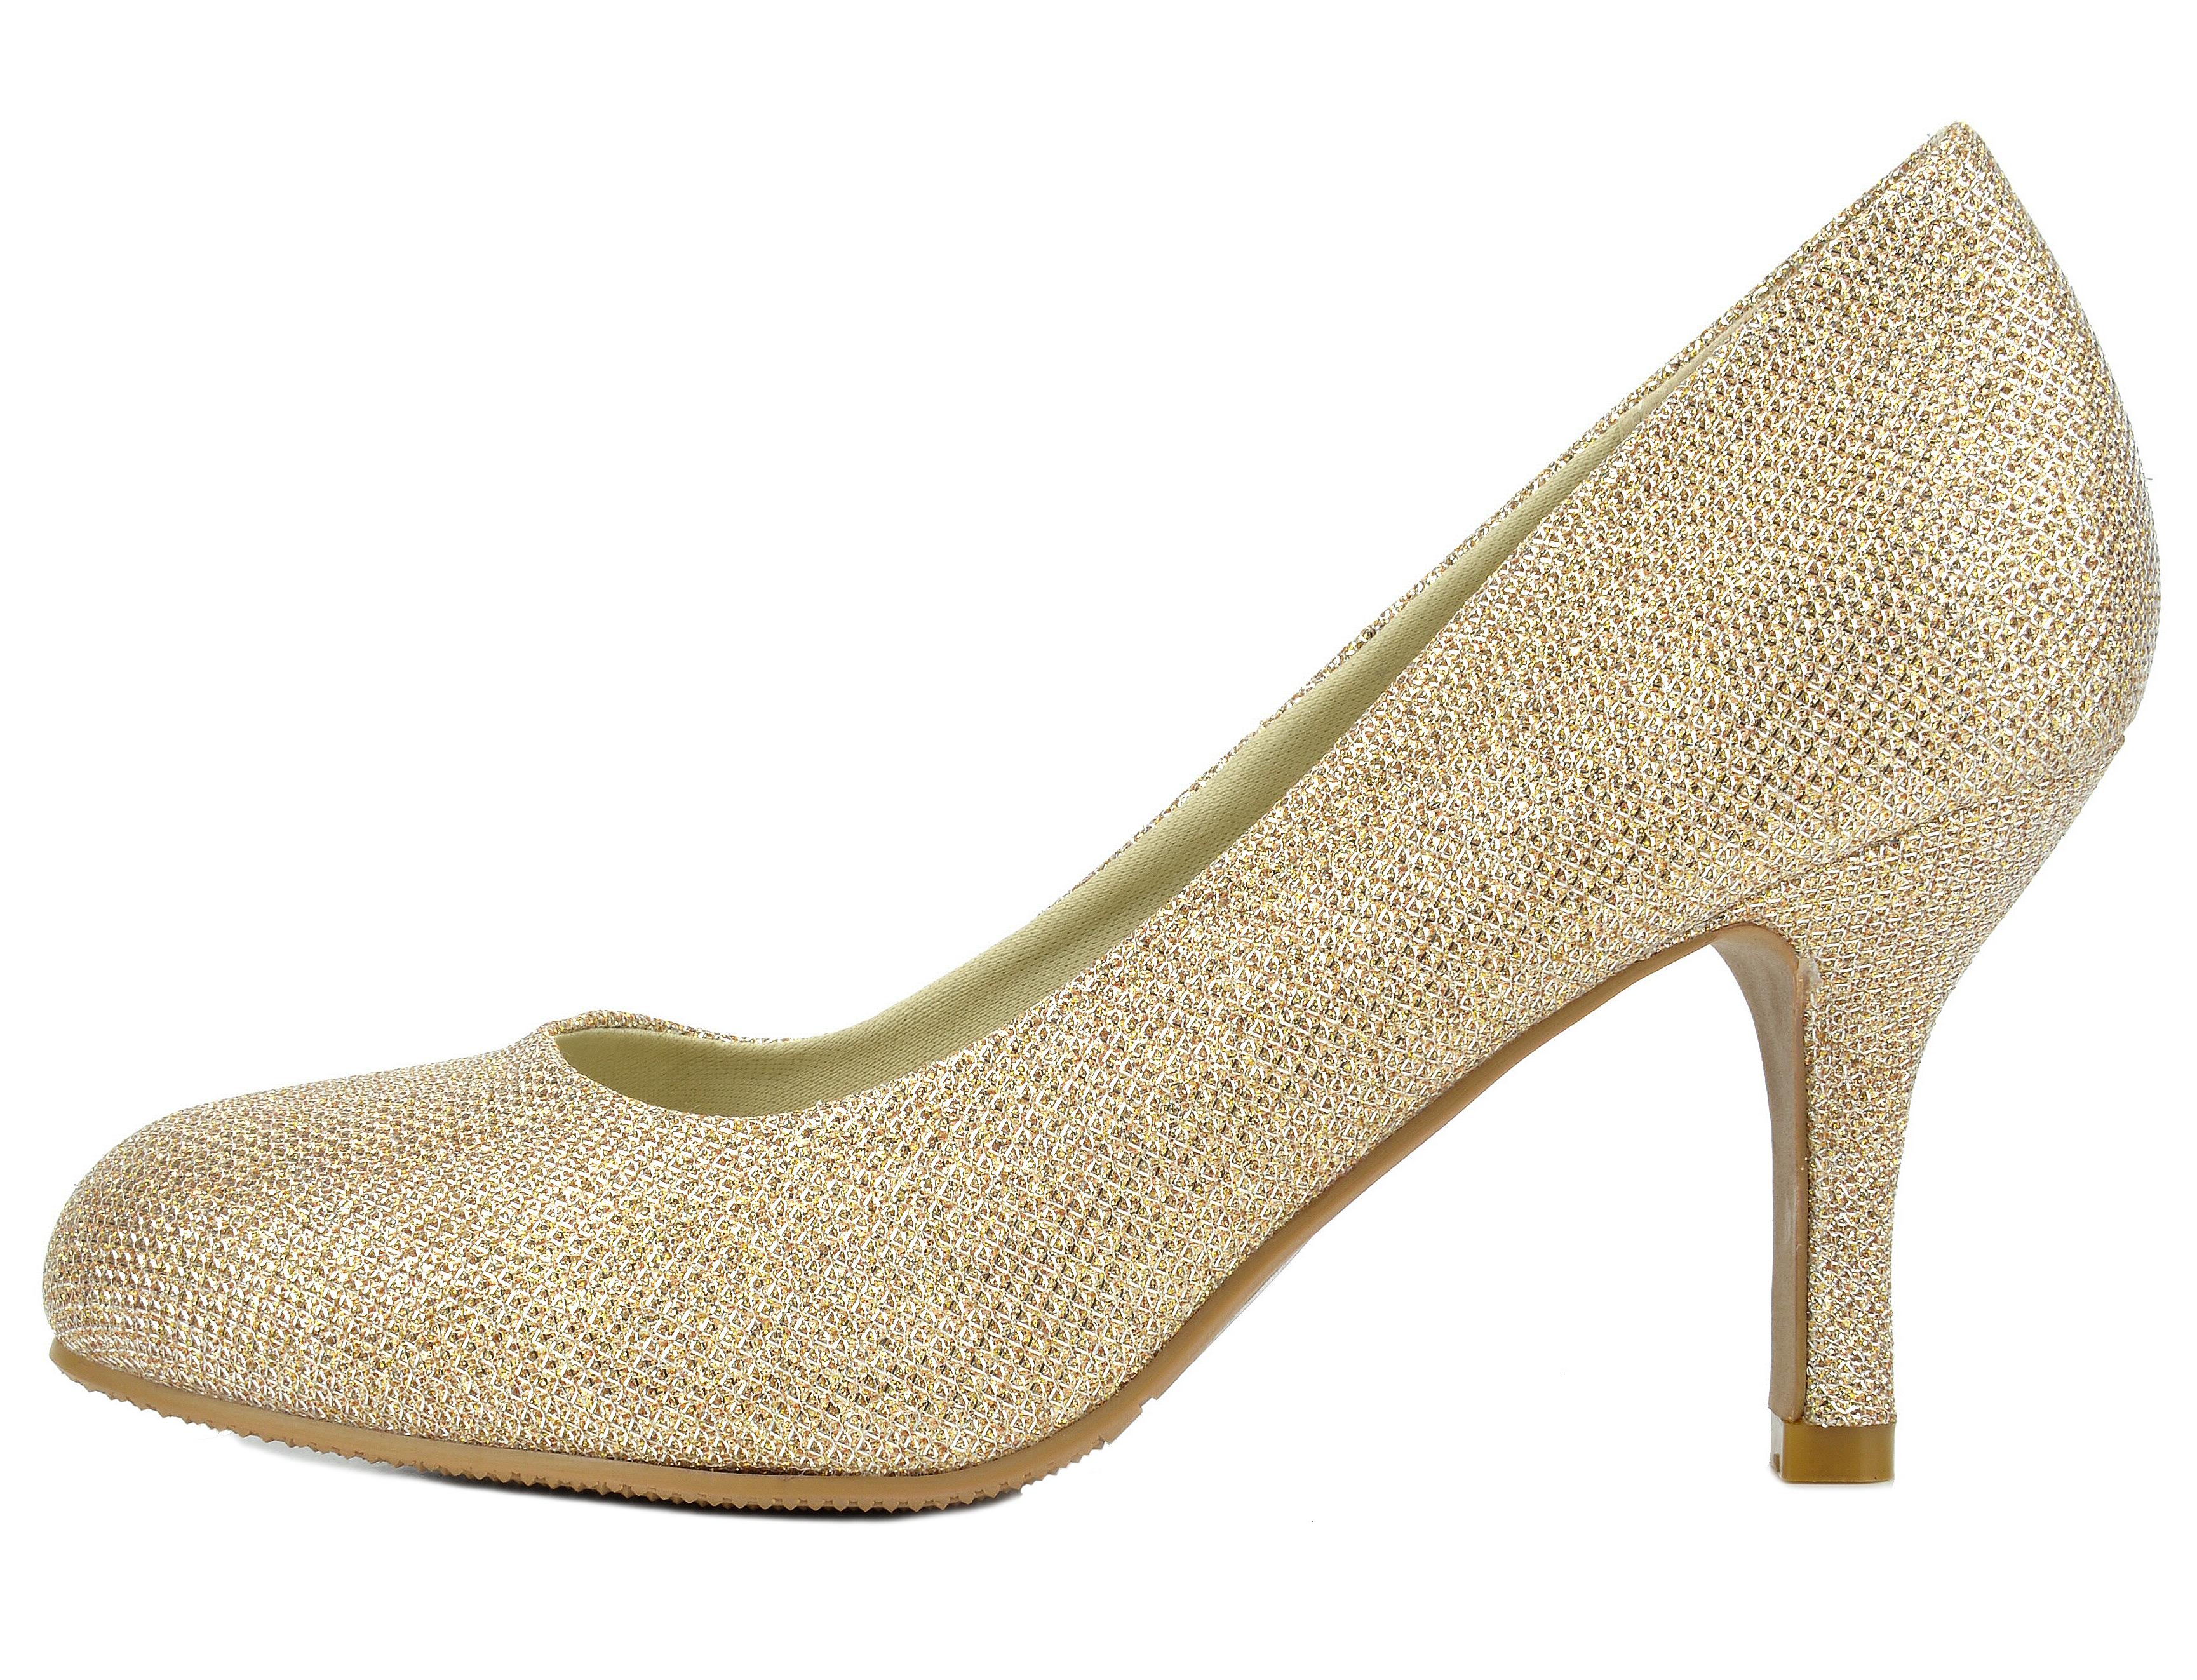 Dressy Low Heel Evening Shoes